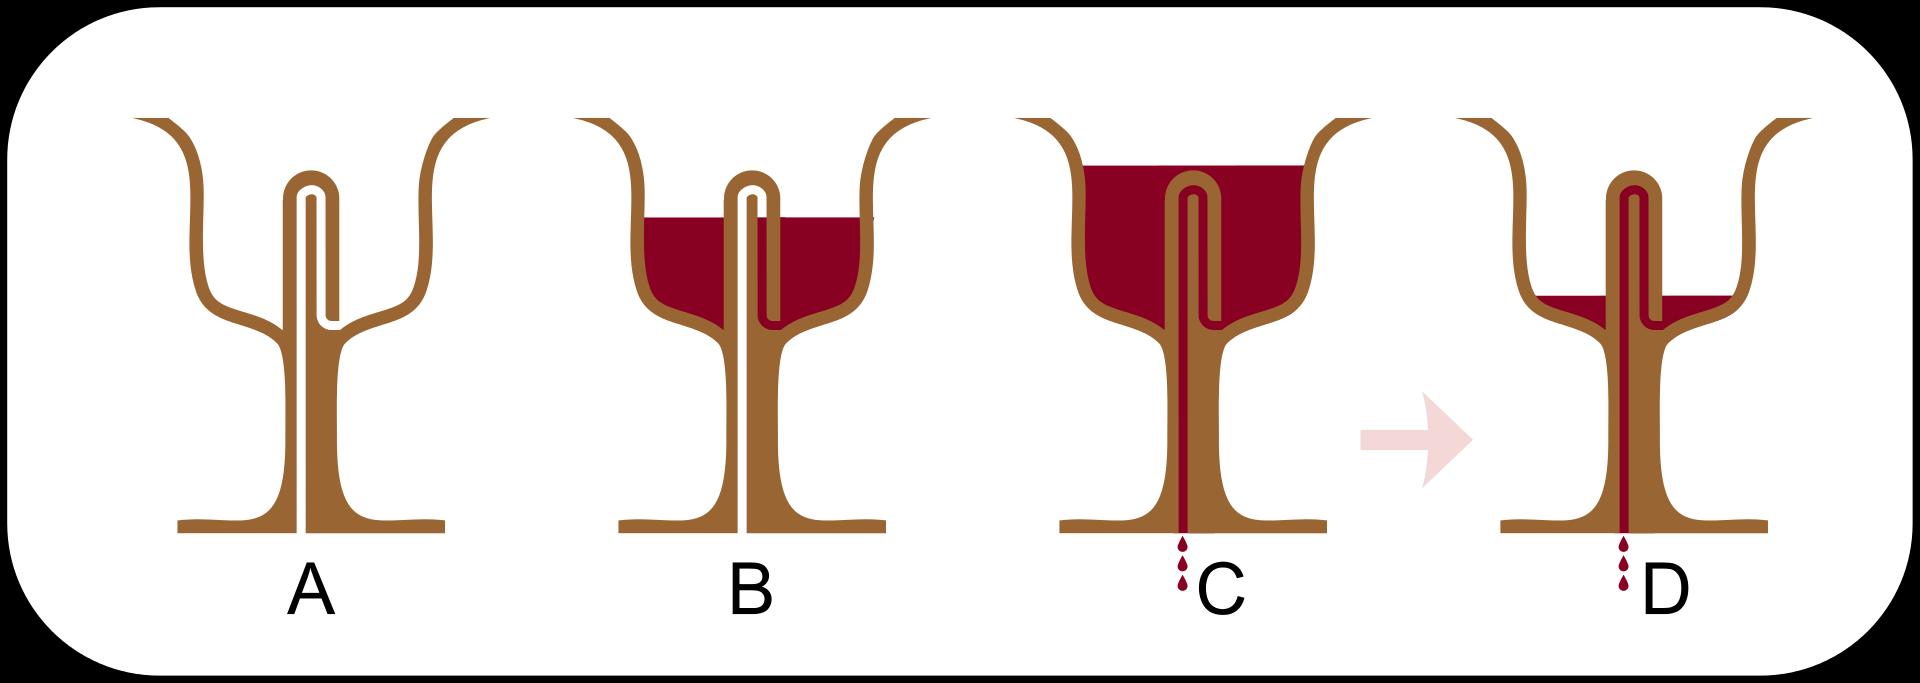 Pythagoras_Greedy_Tantalus_cup_1